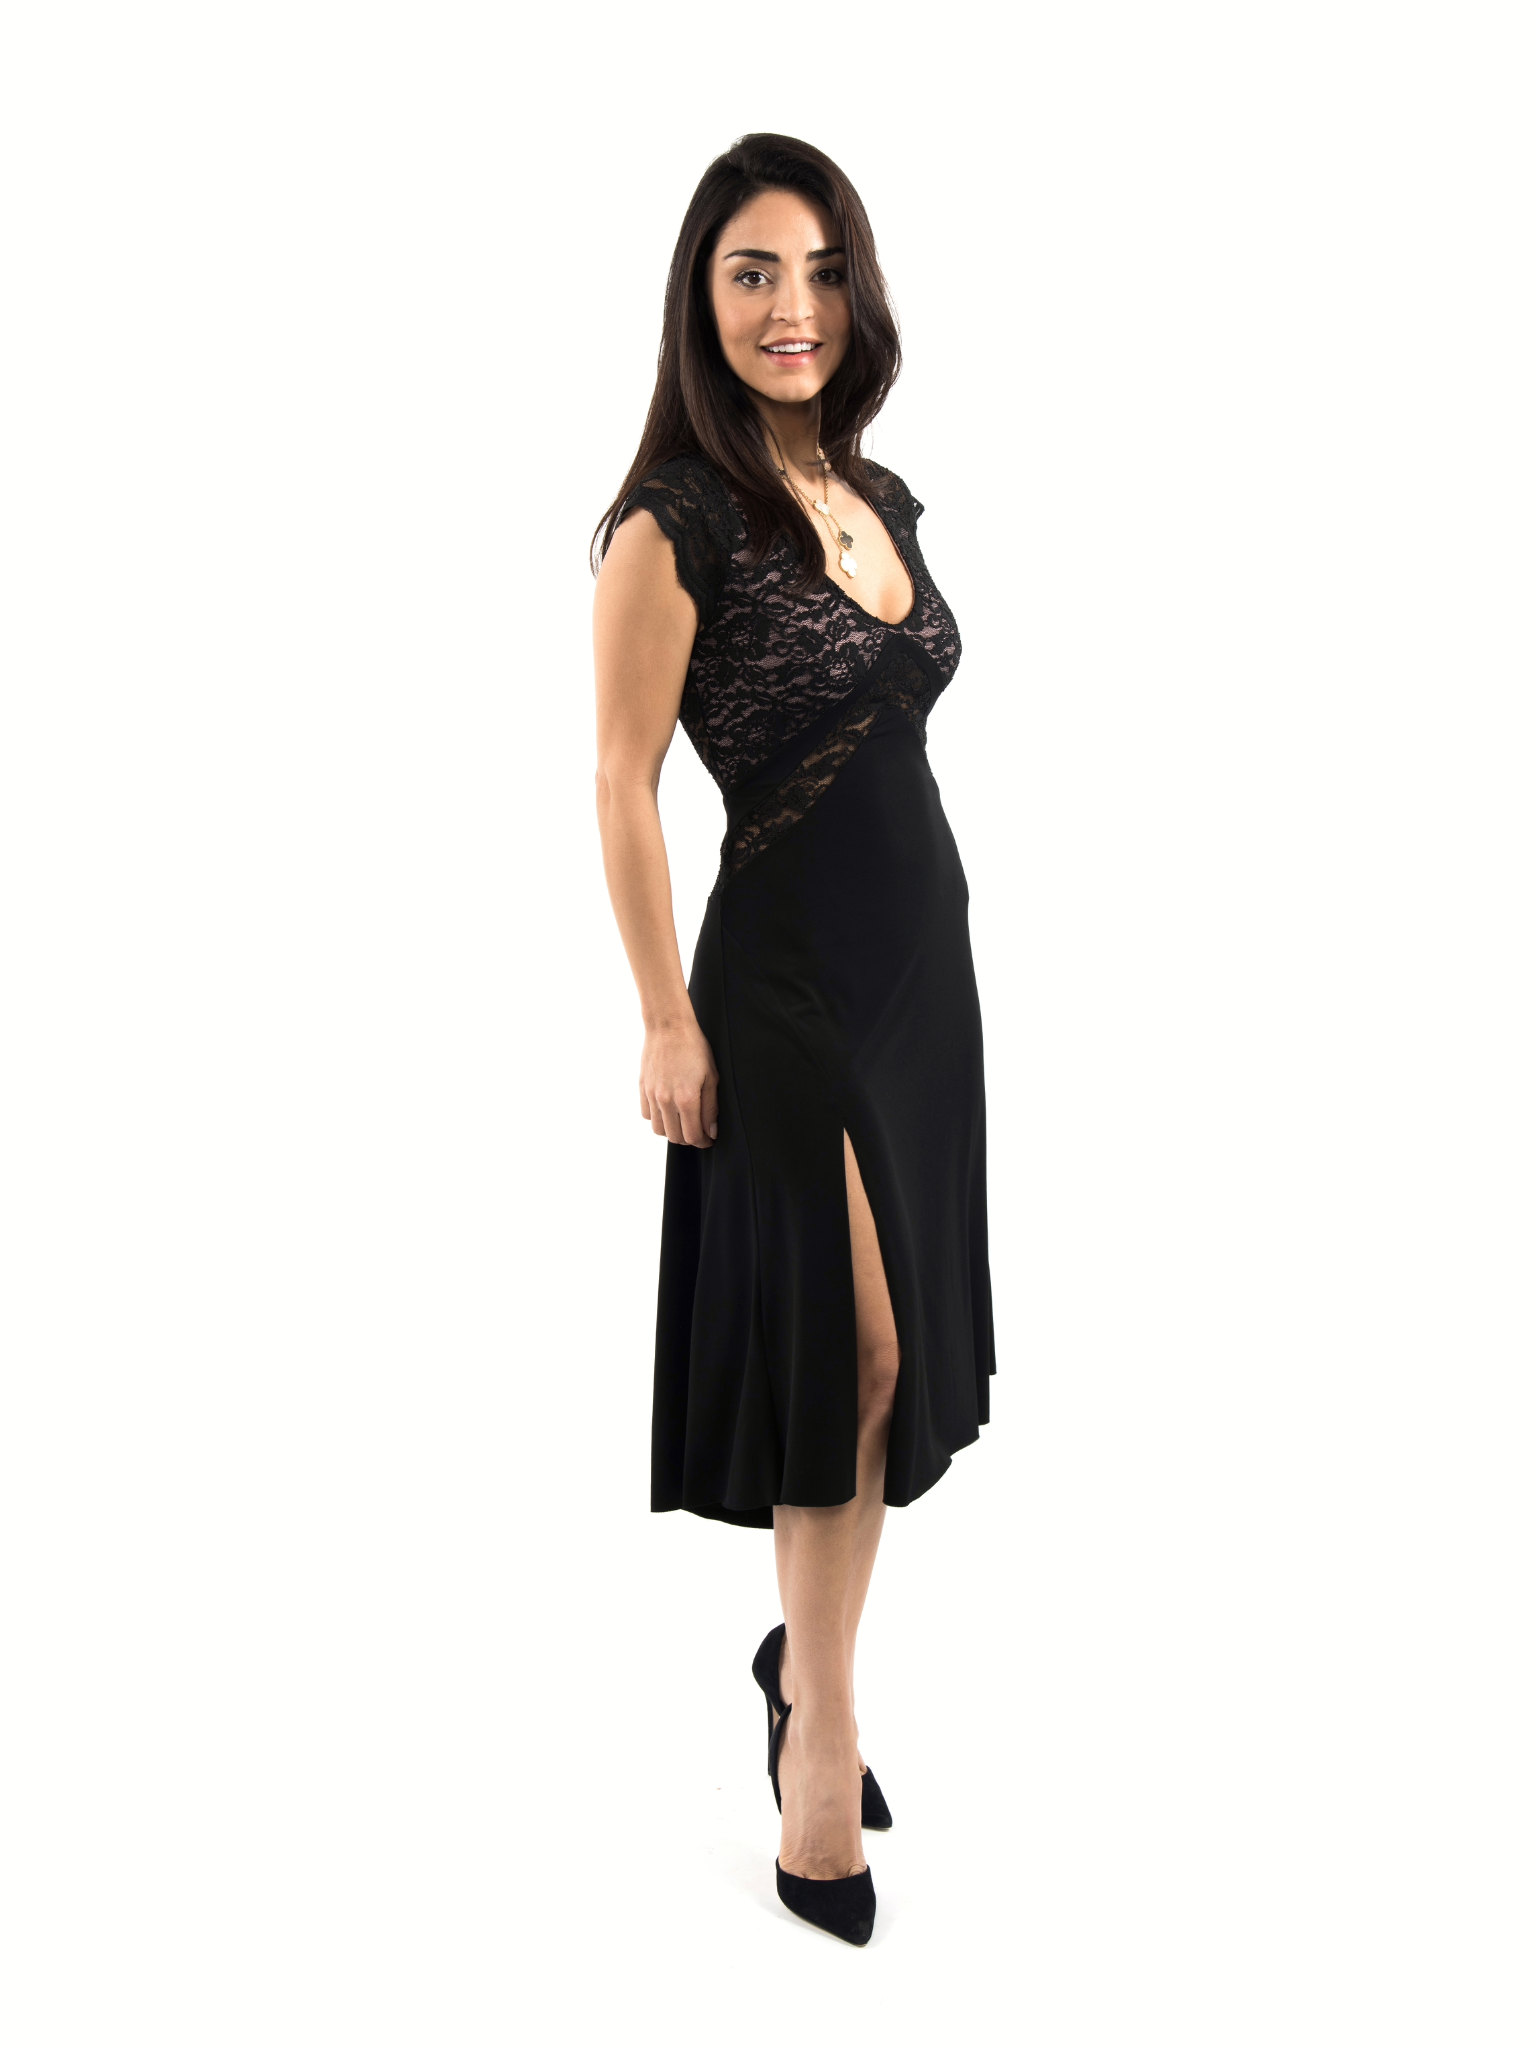 V Argentine Tango dress